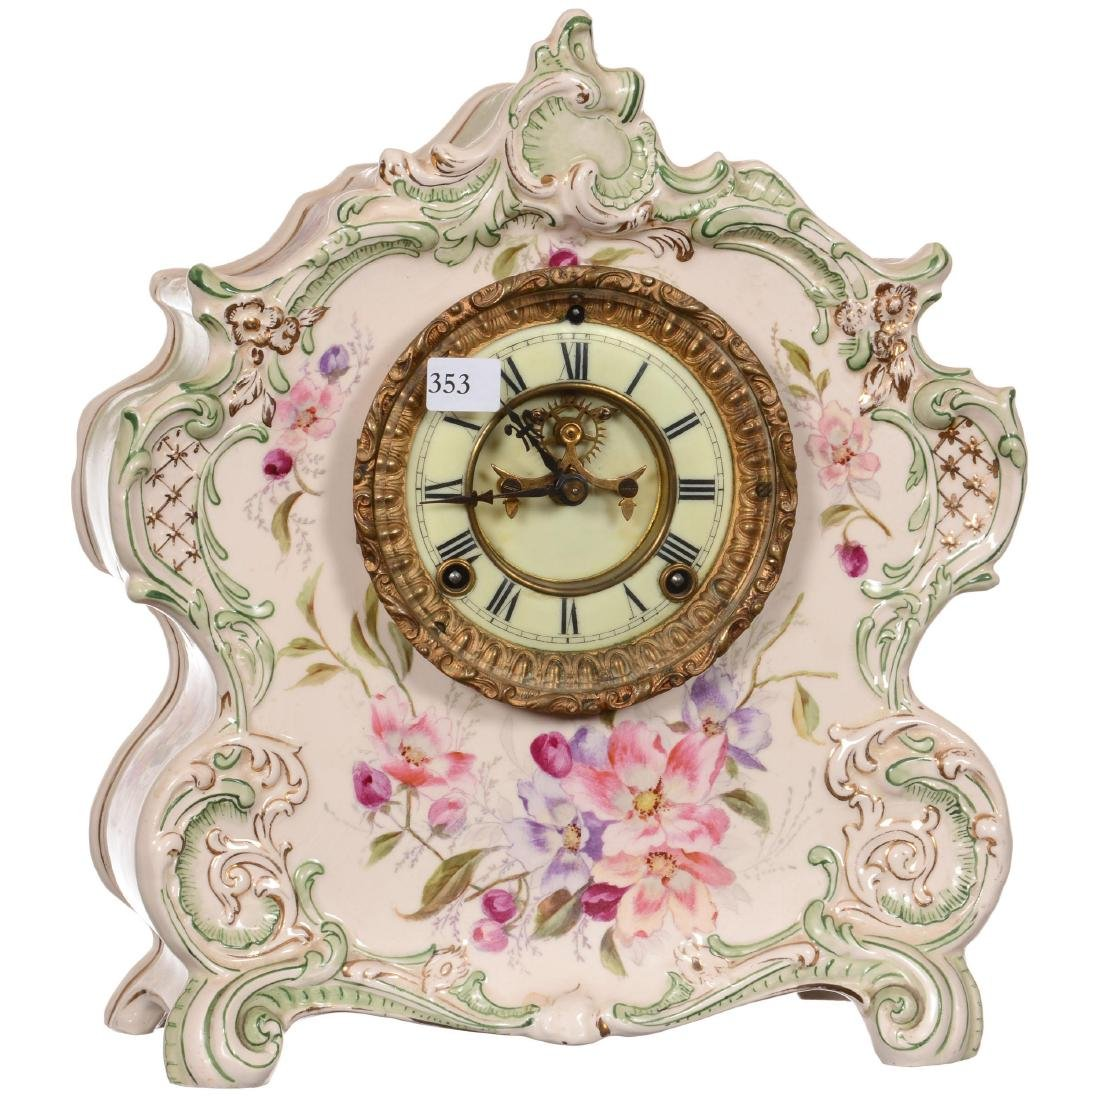 Royal Bonn China Mantel Clock